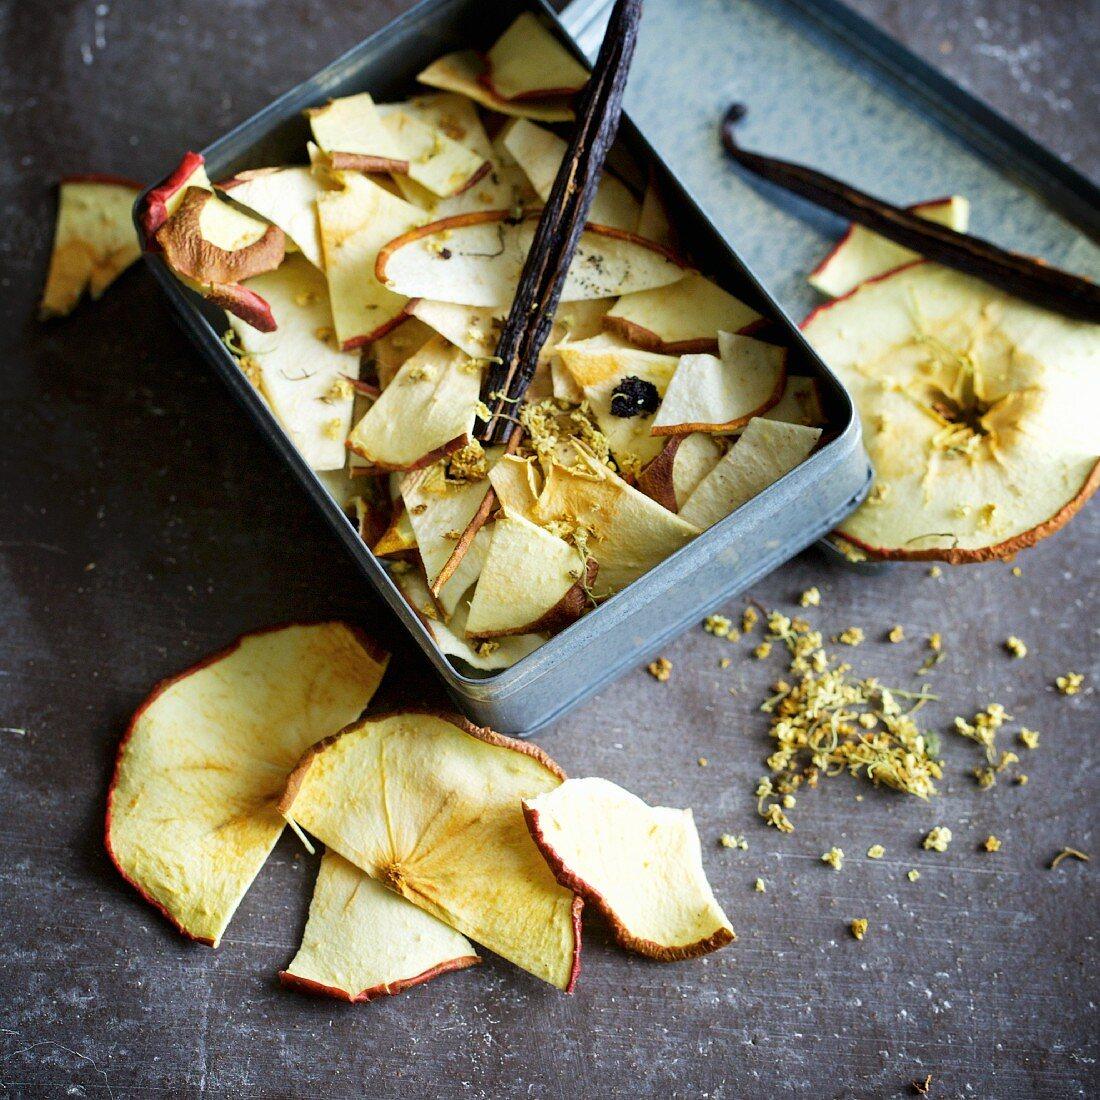 Home-dried apple and elderberry tea